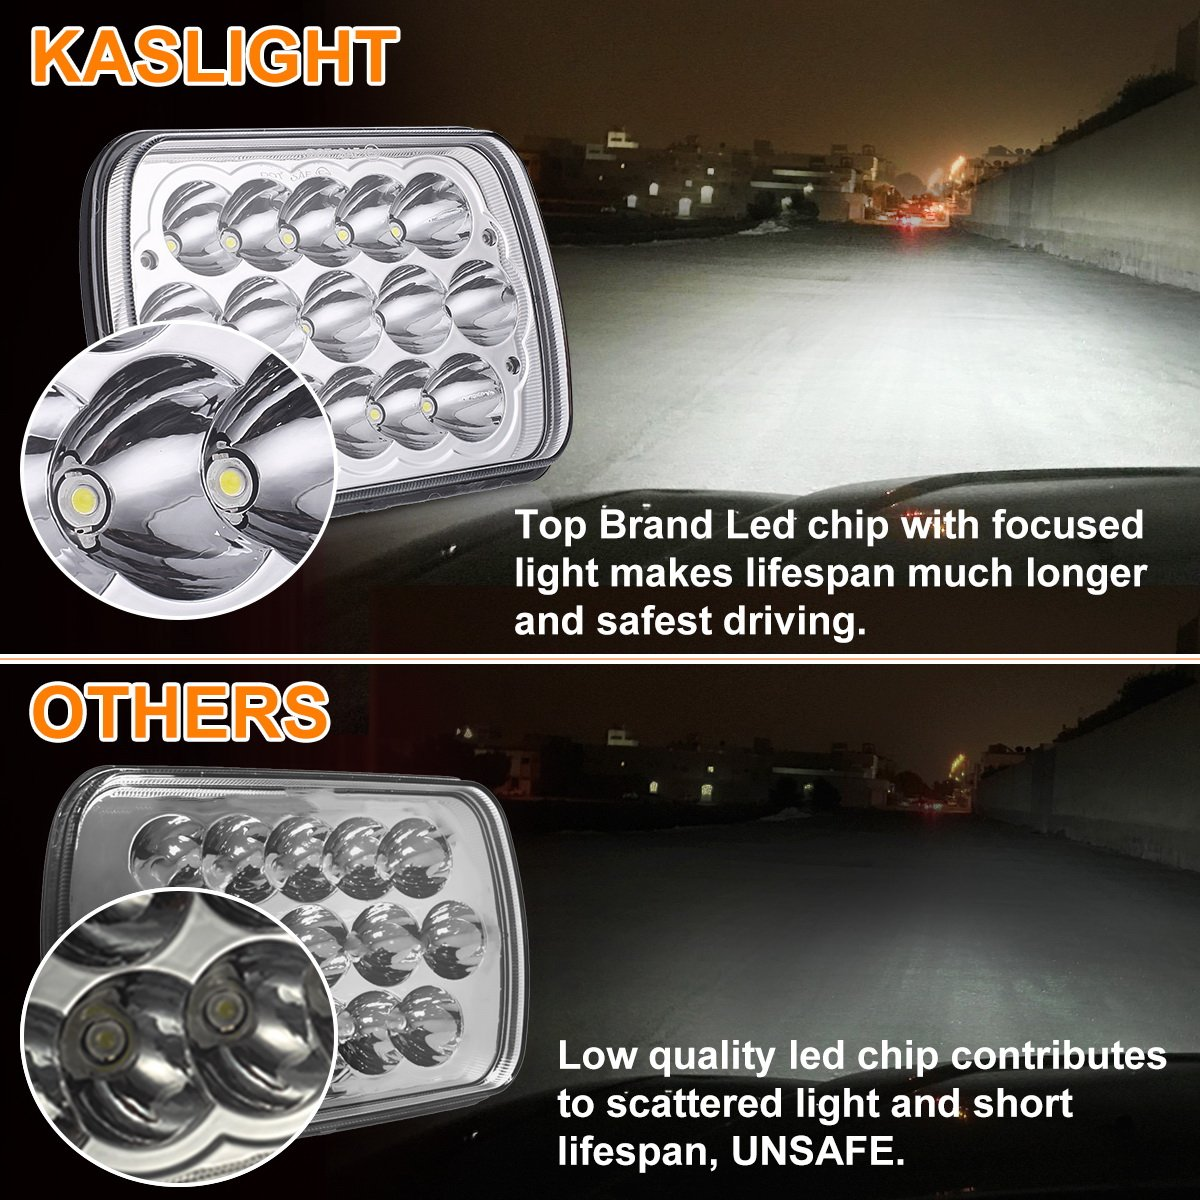 2pcs 7x6 Led Headlights Lamp W H4 Headlight Relay 1991 Jeep Cherokee Sport Wiring Harness Sealed Beam 6054 H6054 5x7